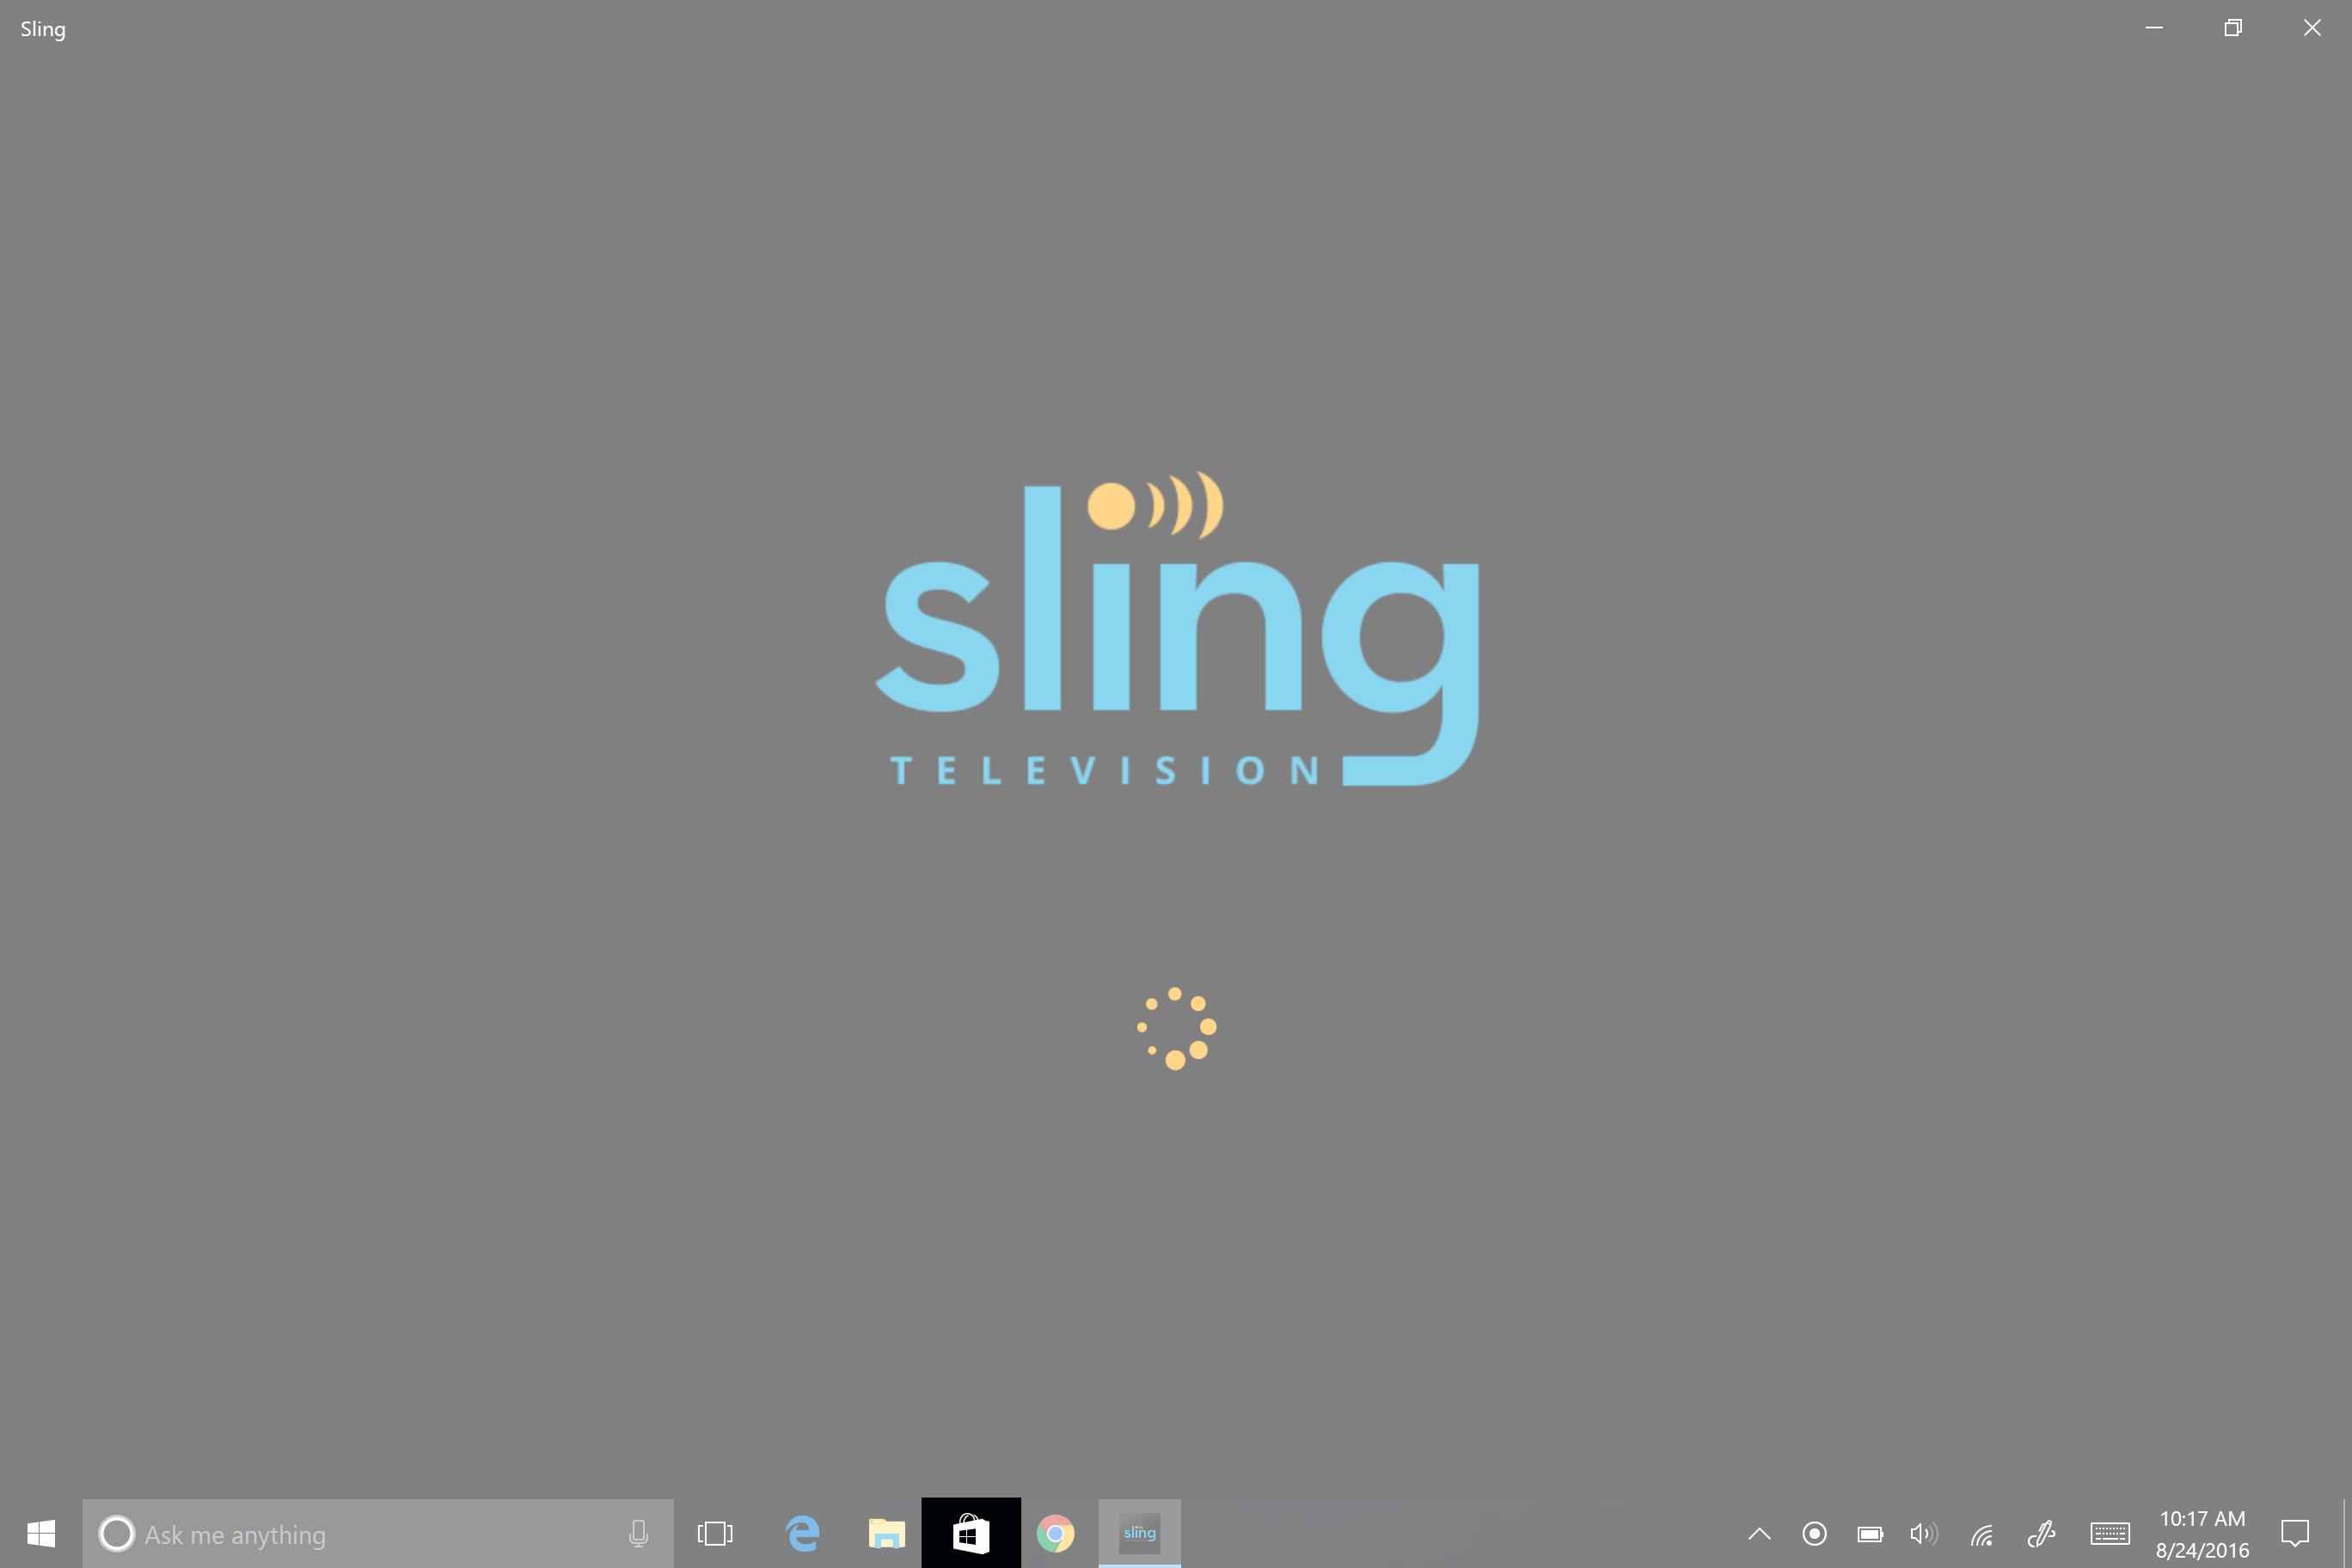 How do I update the Sling TV application on Windows 10?